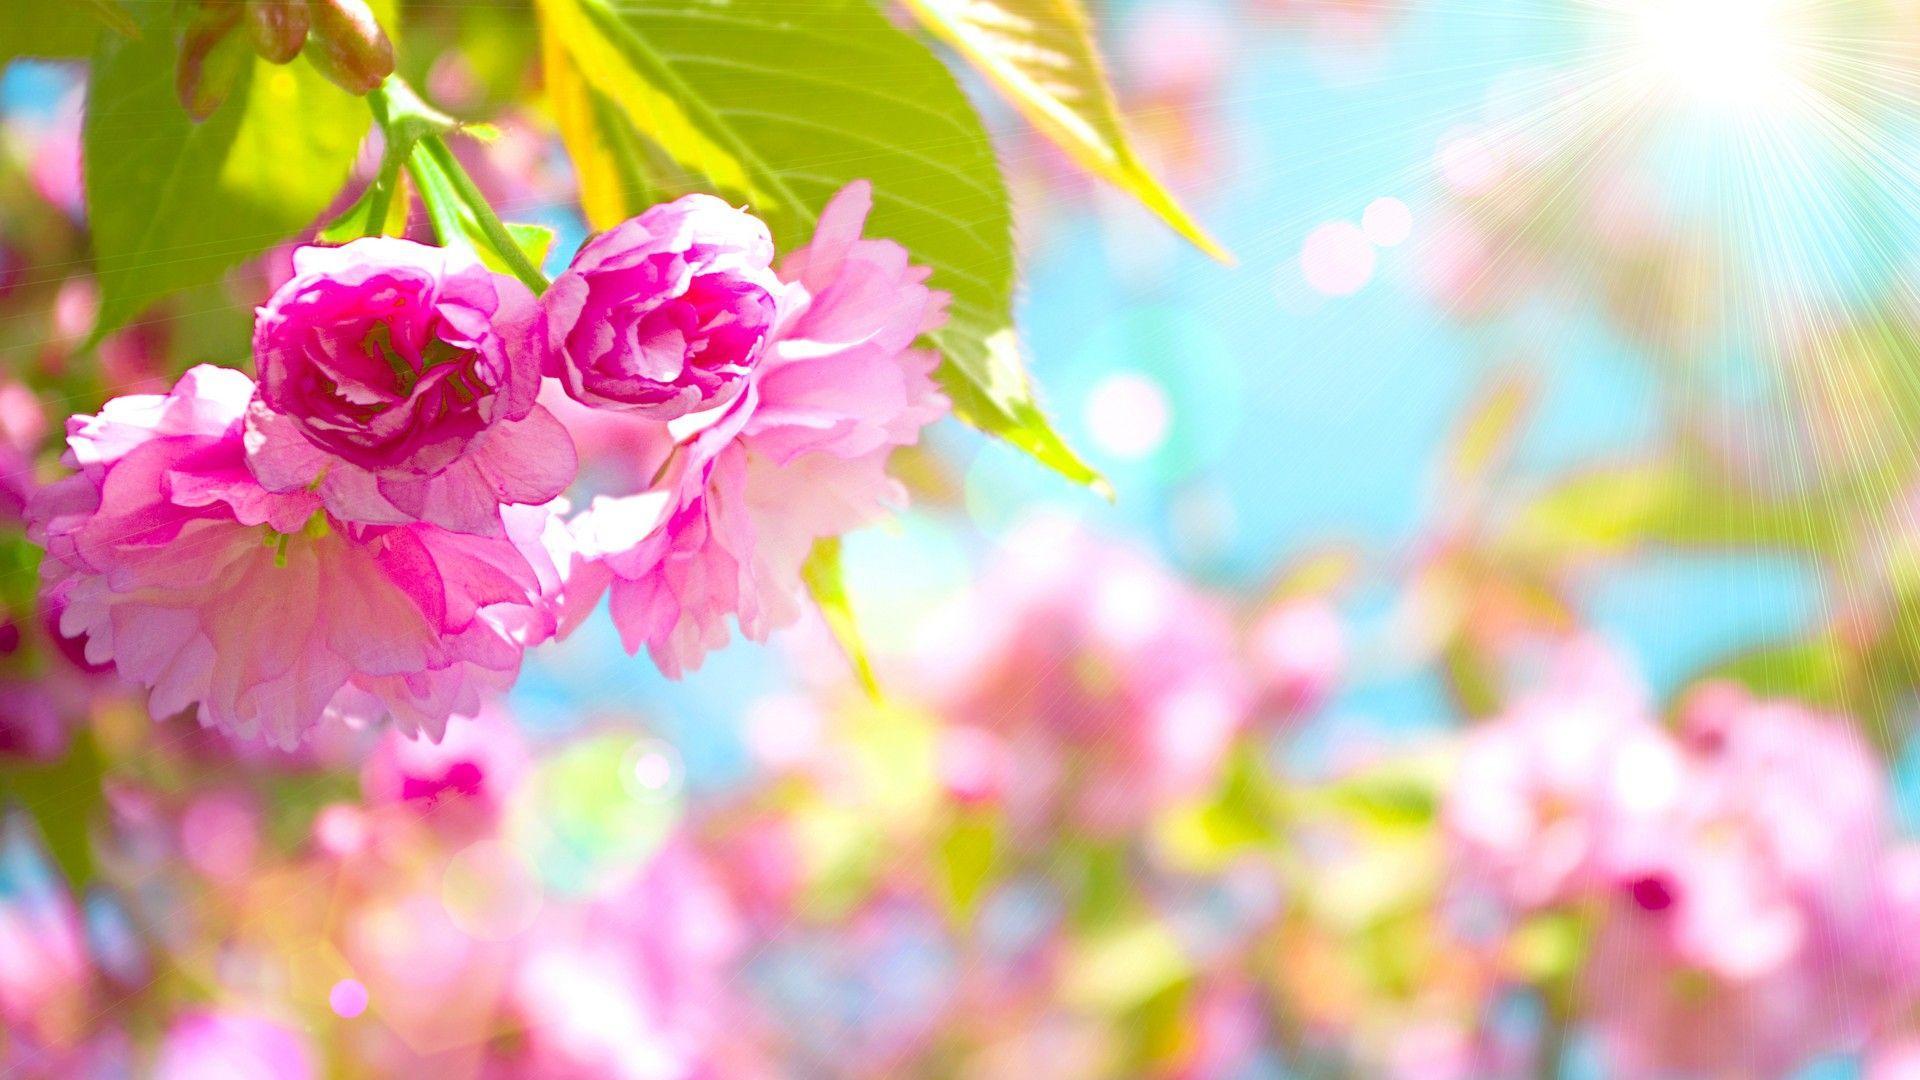 Spring flowers 2018 wallpapers wallpaper cave wallpapers spring flowers 2018 cute screensavers mightylinksfo